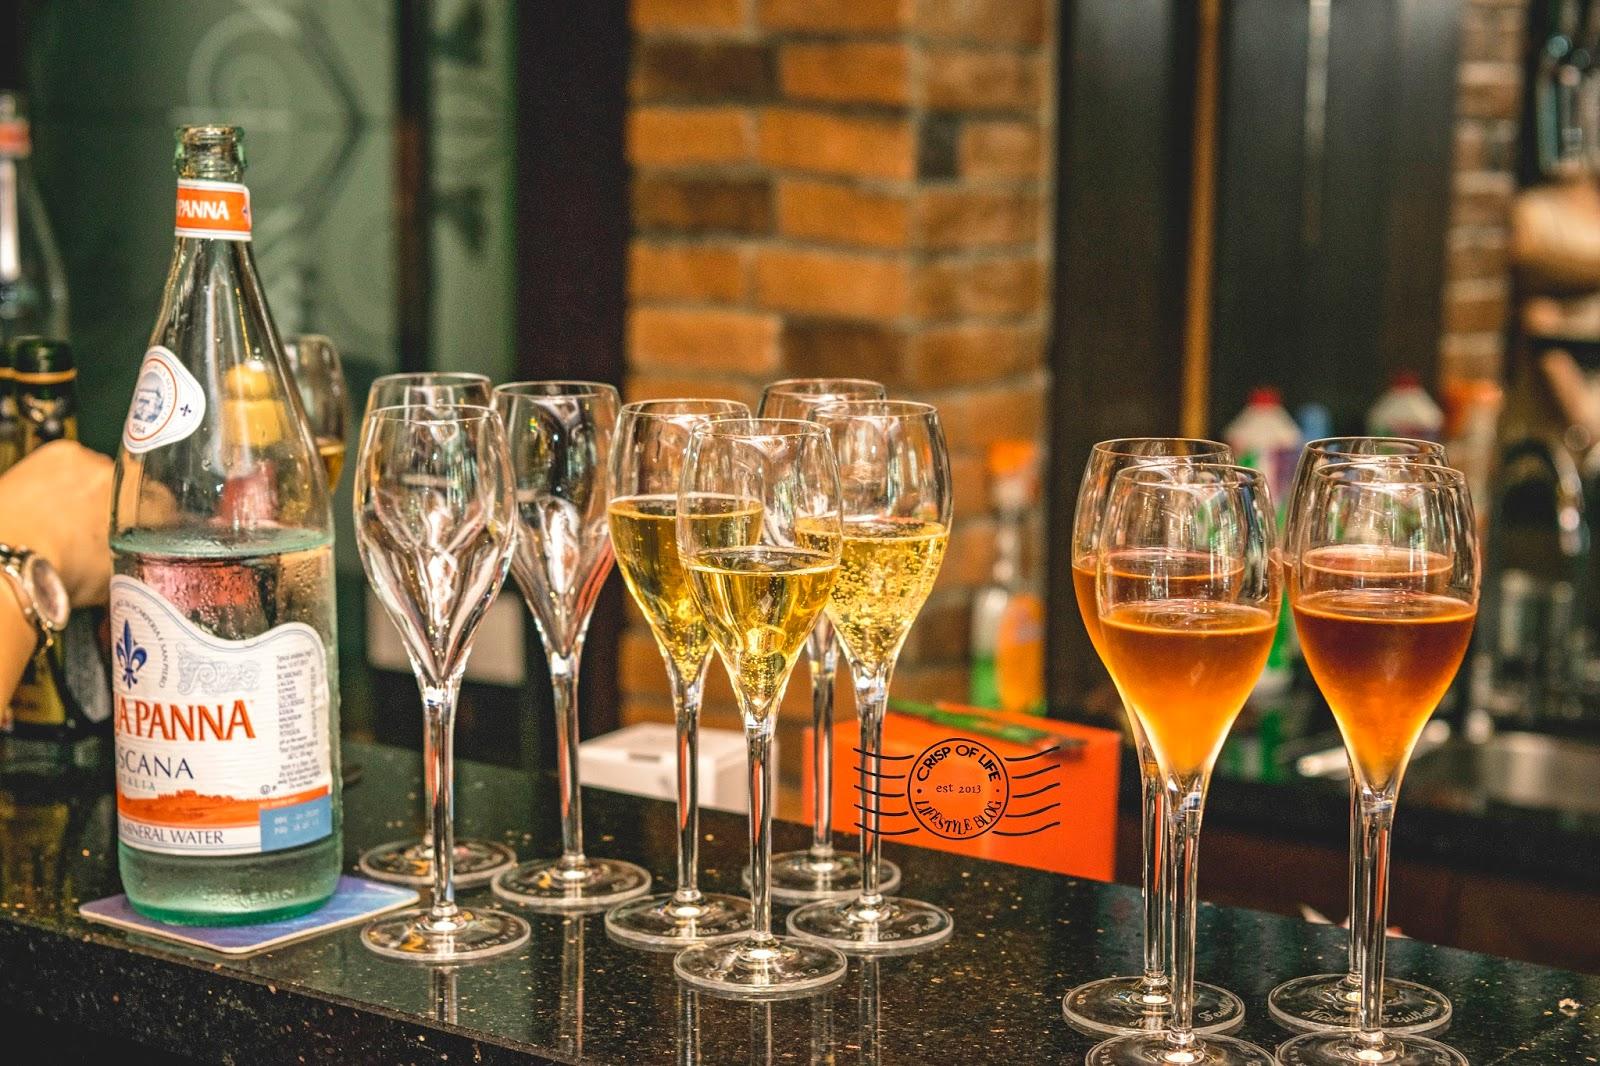 Vino Vino Bistro Champagne Brunch Bay Avenue Bayan Lepas